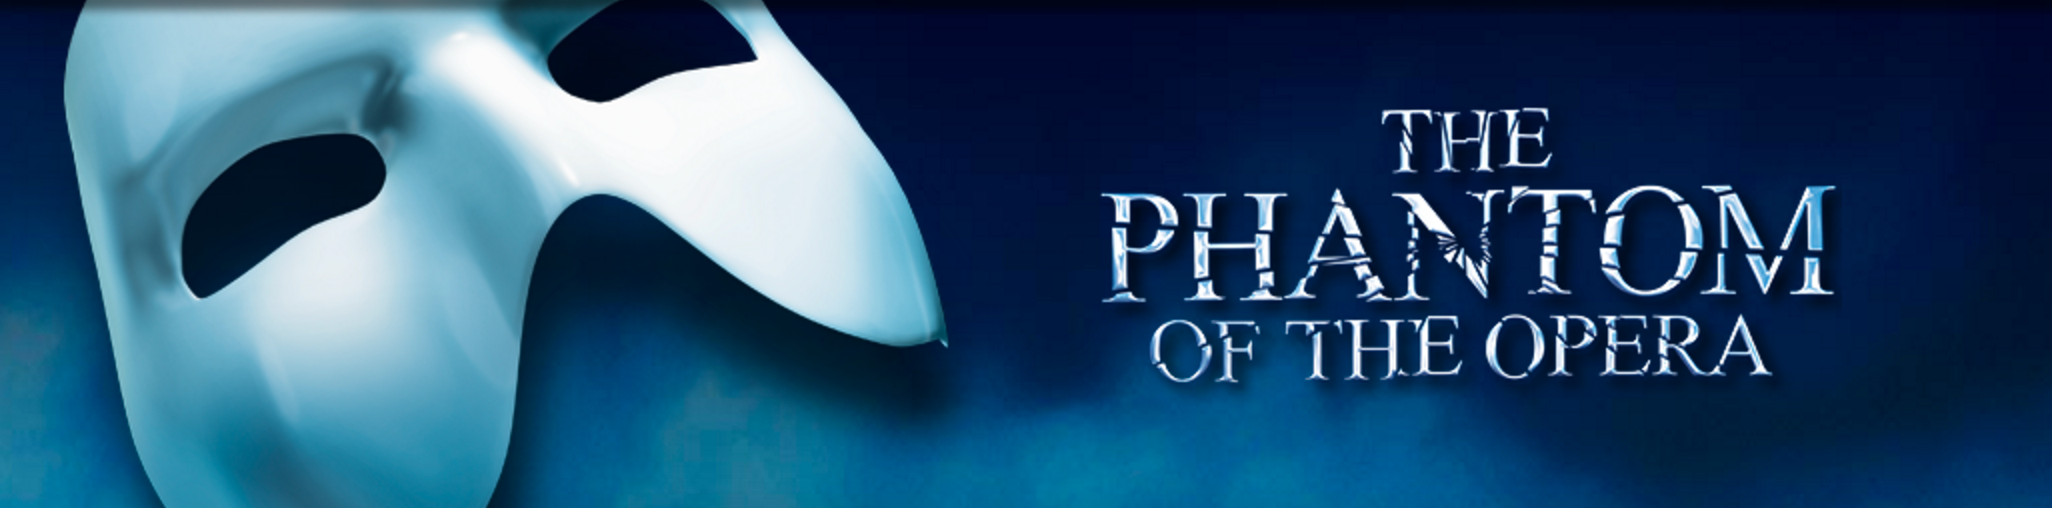 The_Phantom_of_the_Opera01